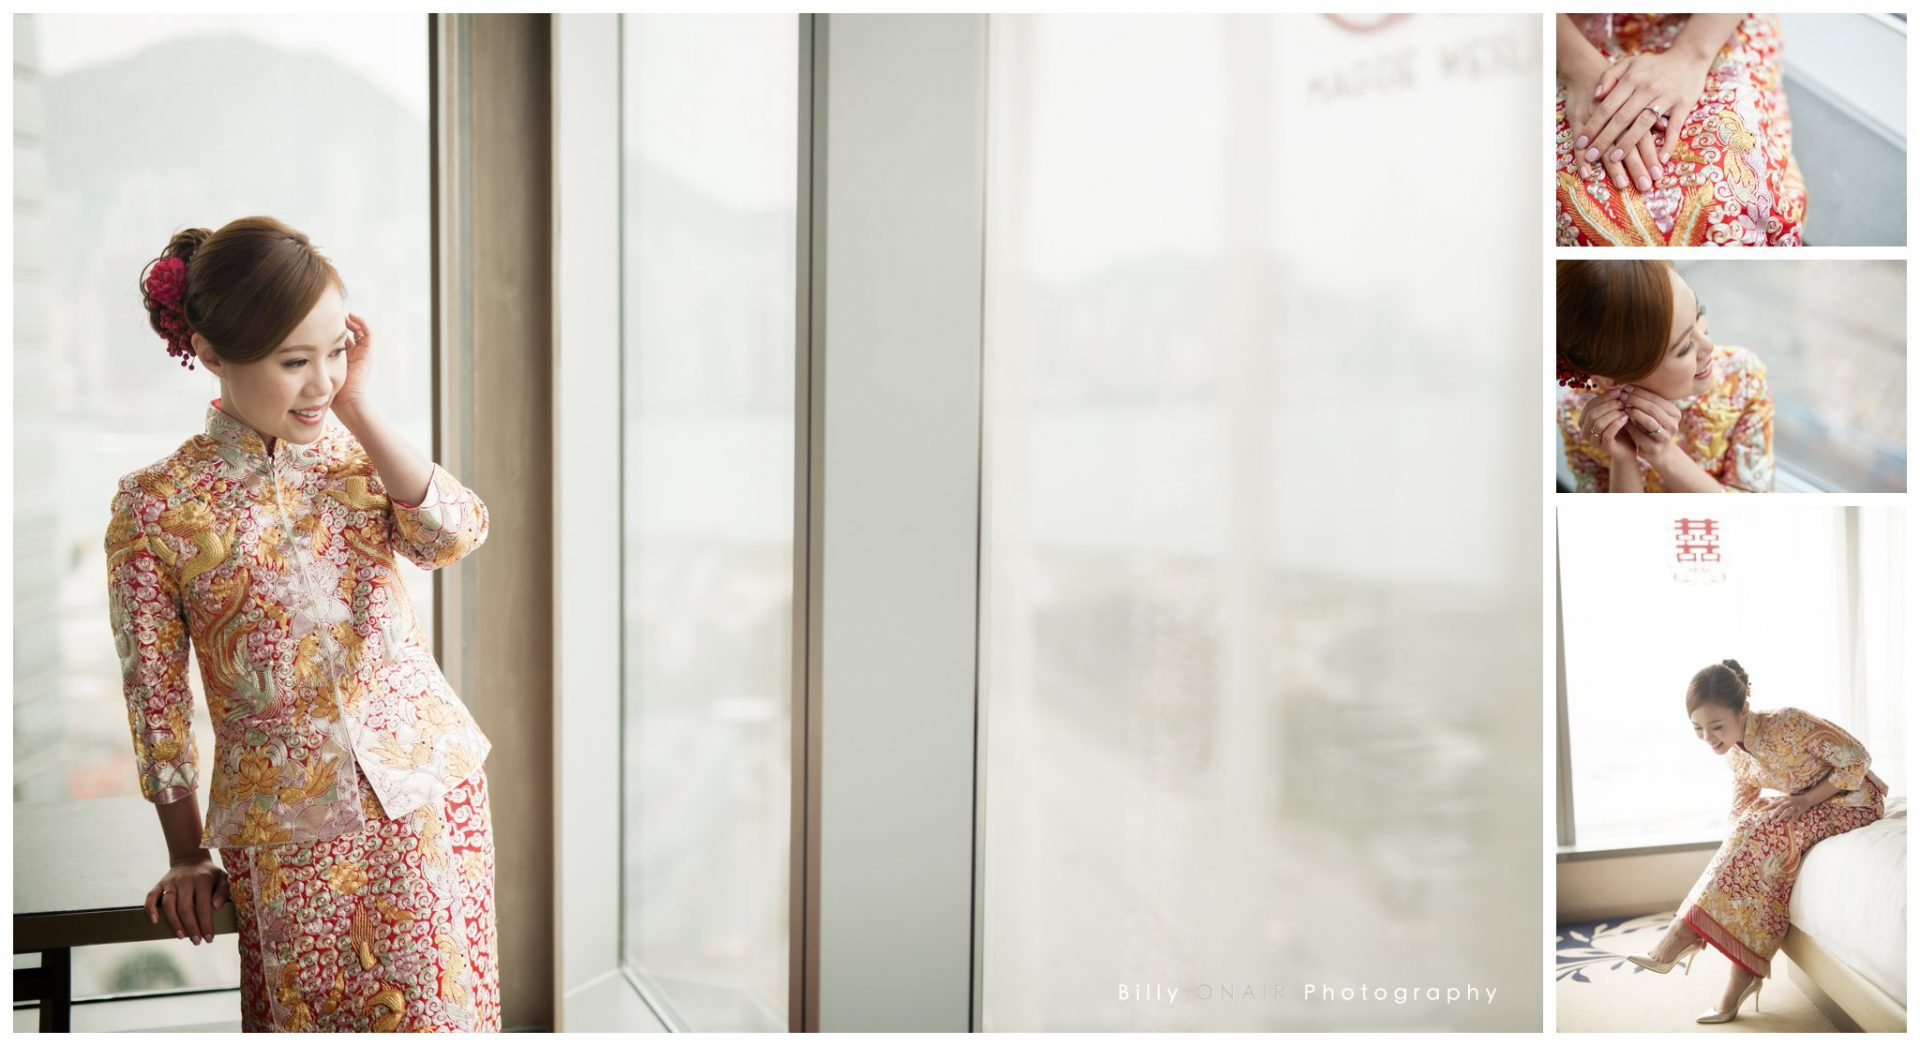 billy_wedding_photography_005